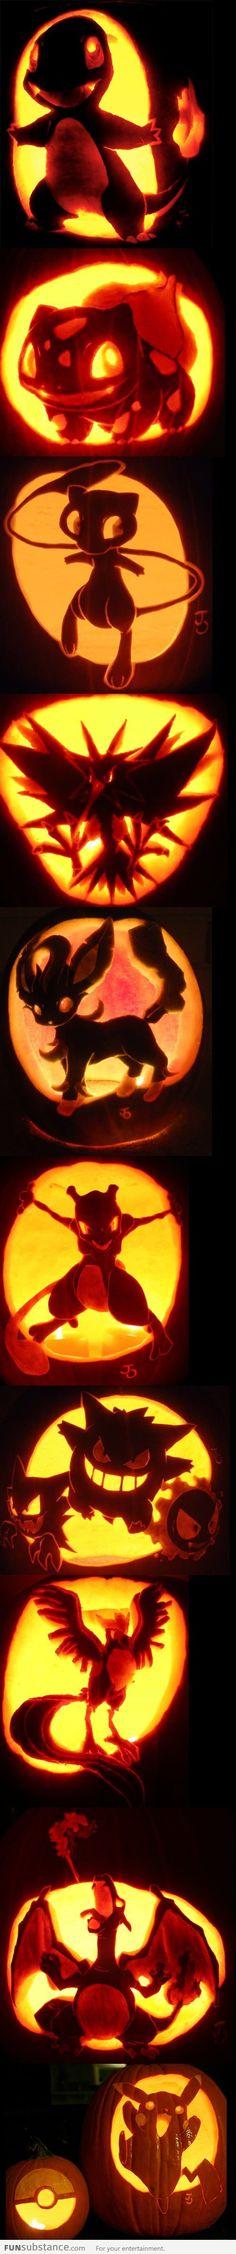 Pokemon pumpkin carvings